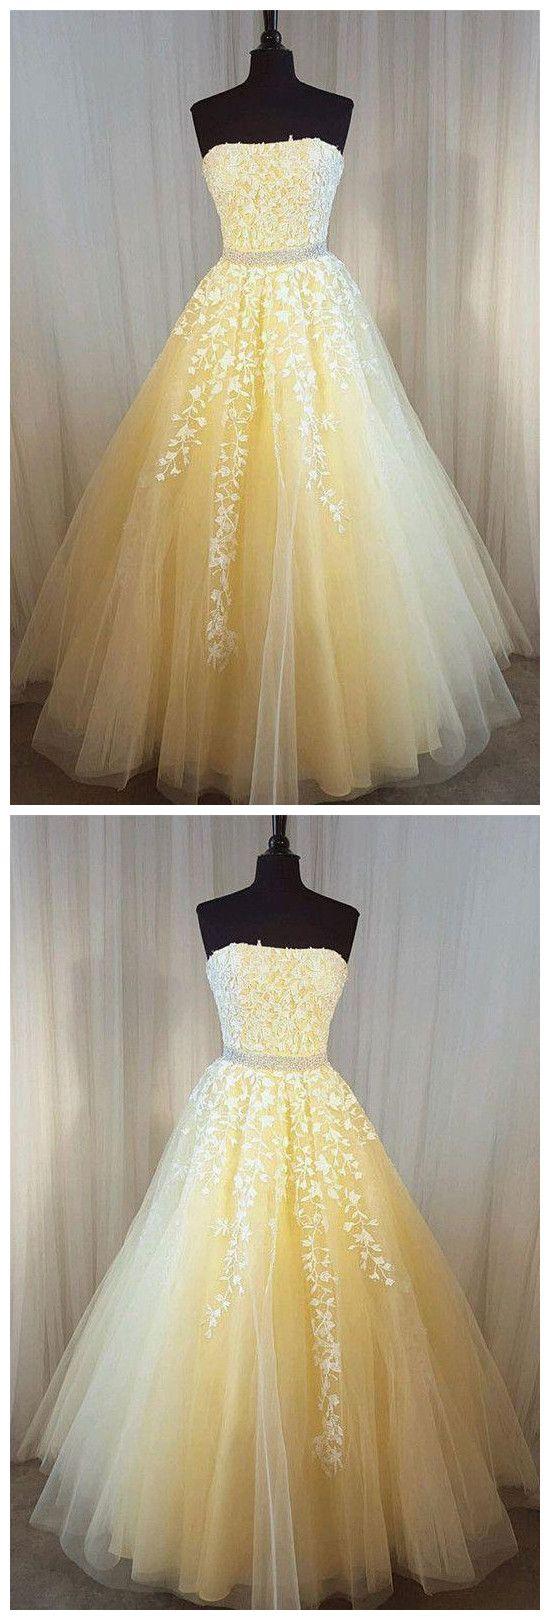 Aline prom dress strapless aline applique tulle daffodil prom